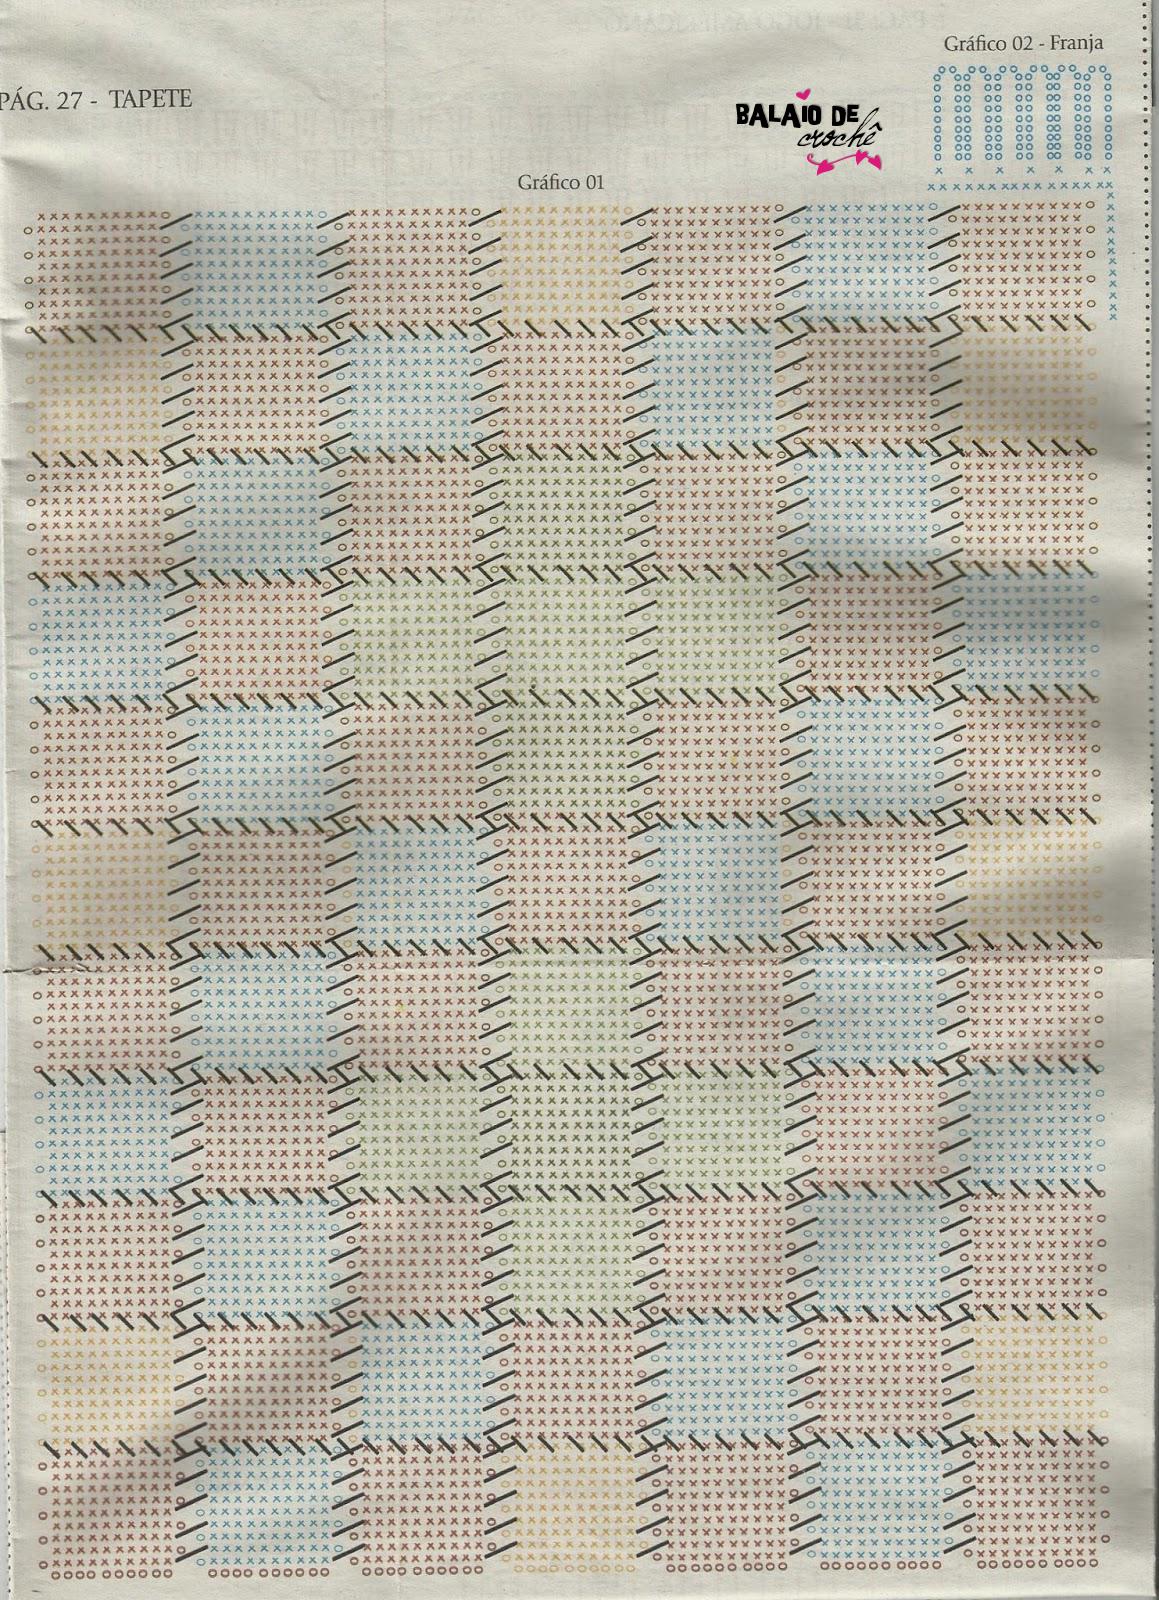 Tapete de crochê estilo patchwork